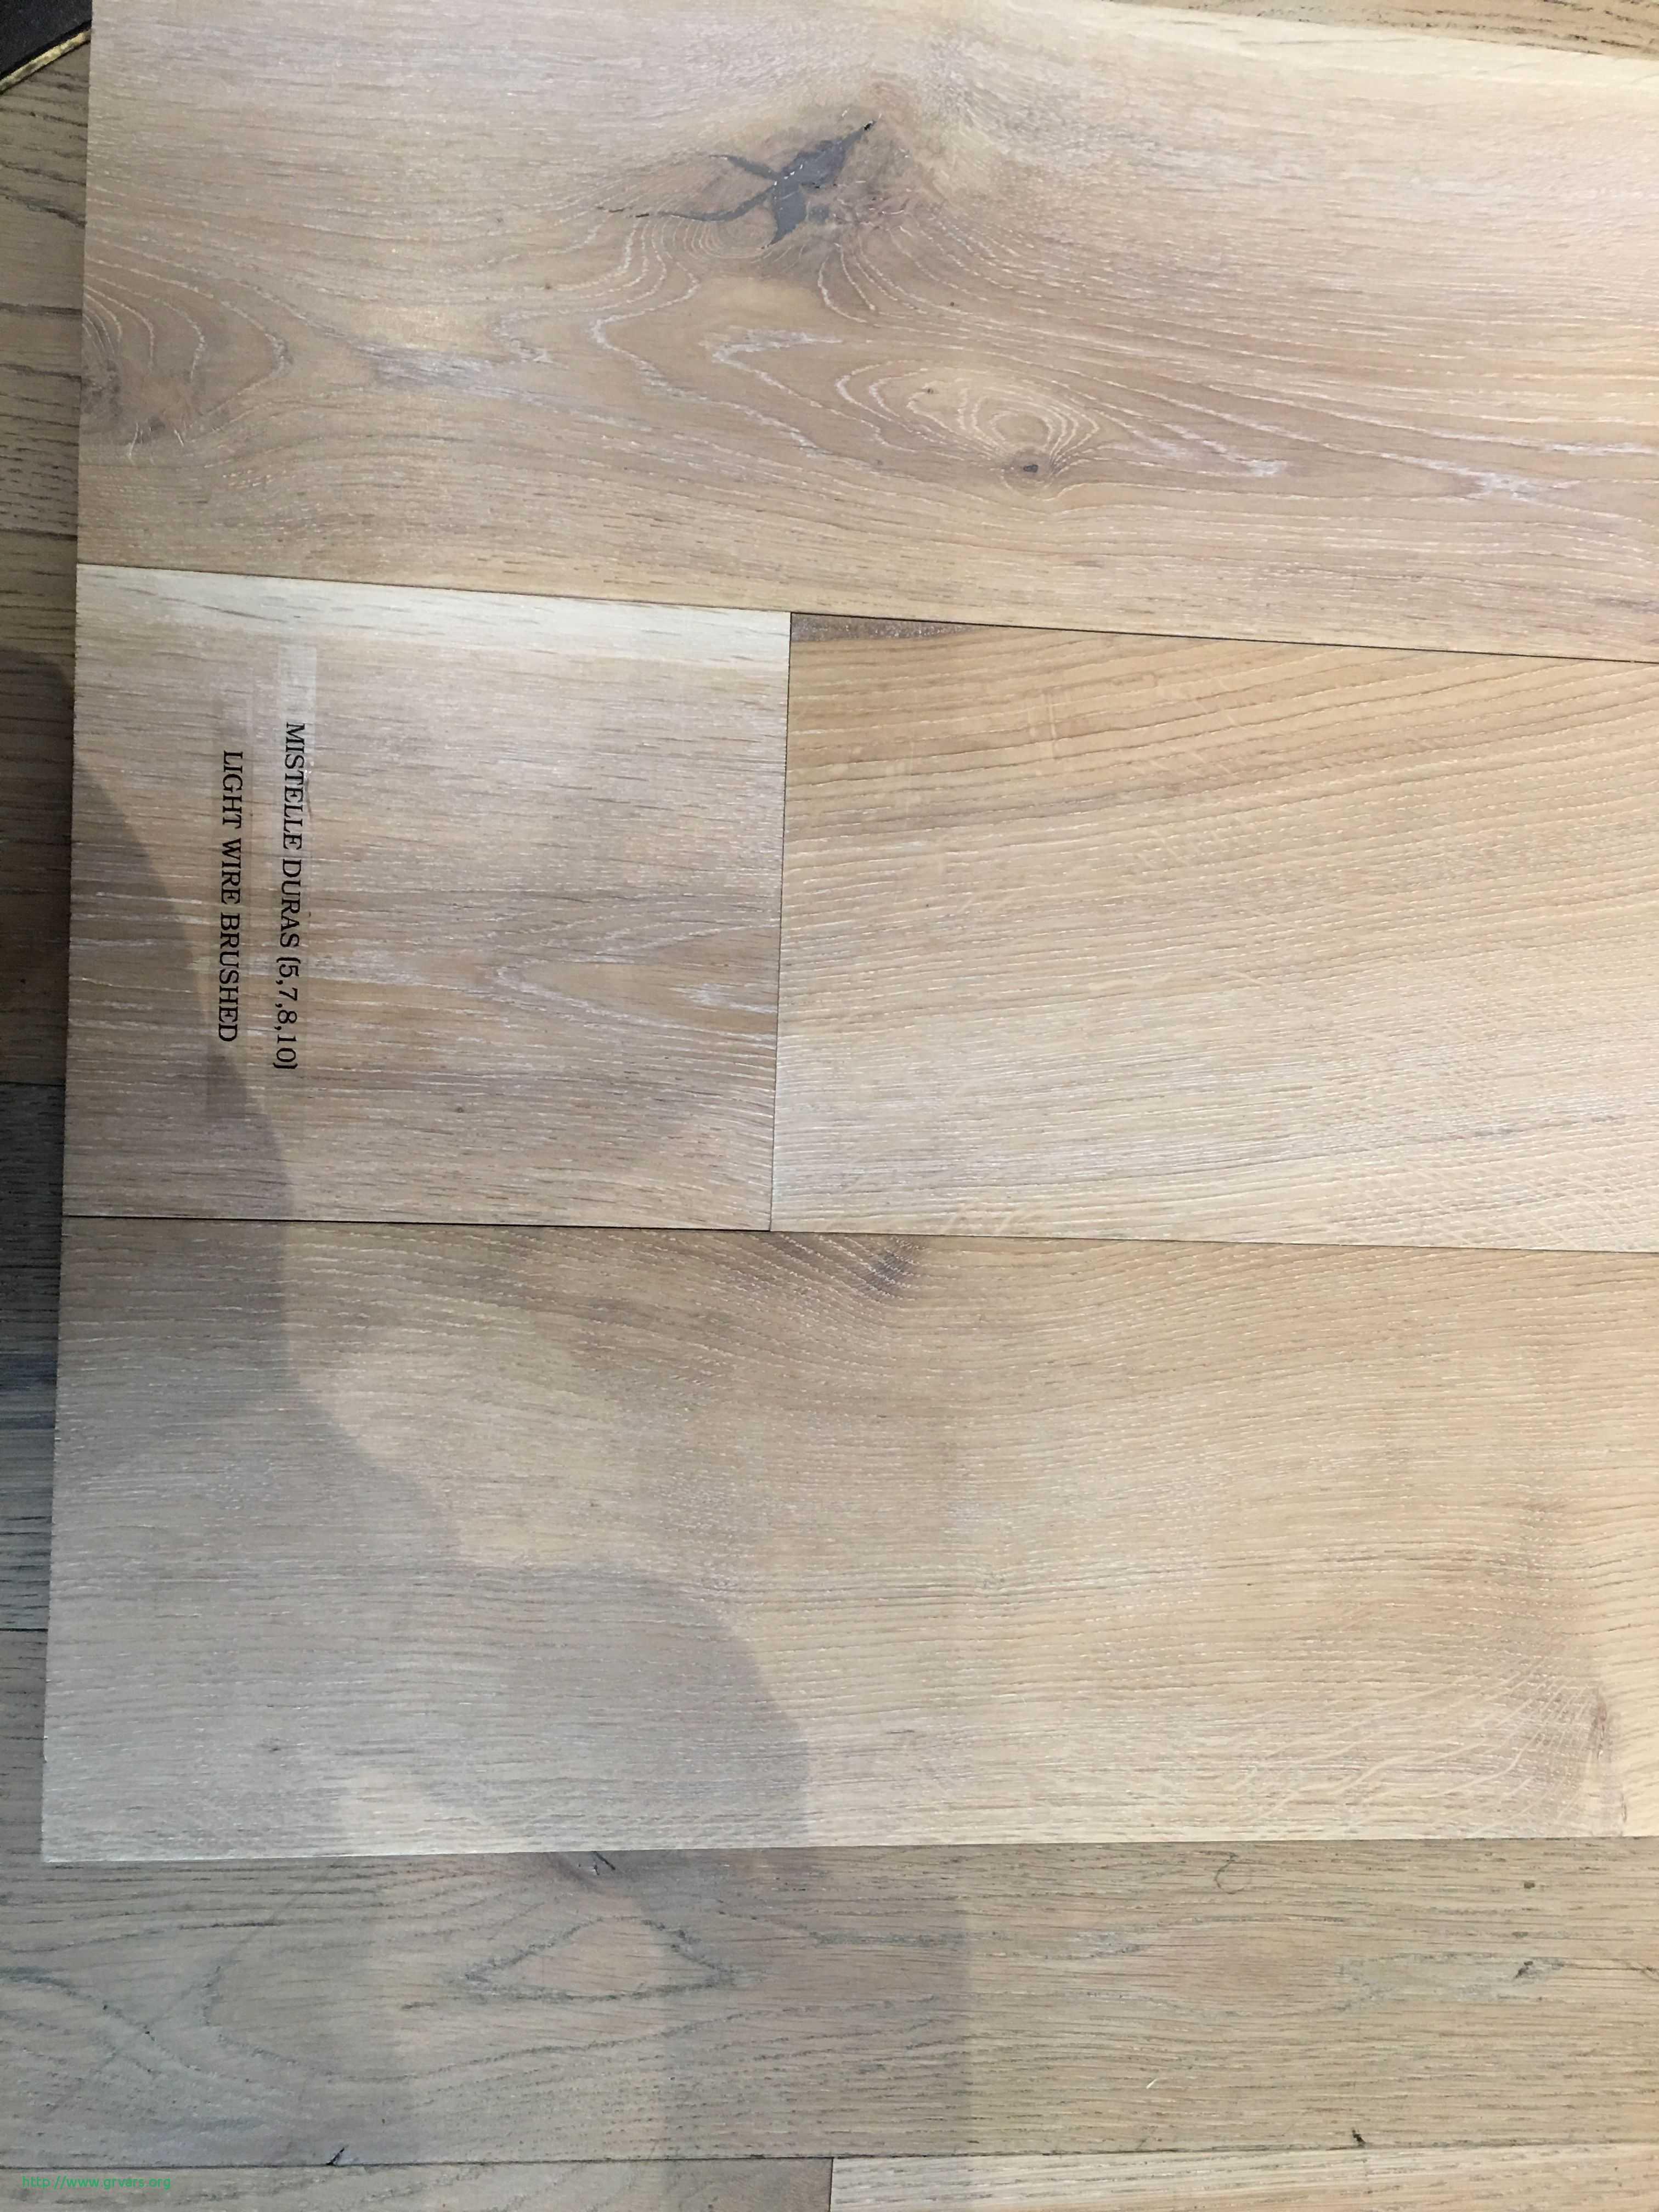 hardwood flooring san jose ca of precision flooring san jose impressionnant precision flooring inside precision flooring san jose frais monarch plank mistelle collection duras for new flooring